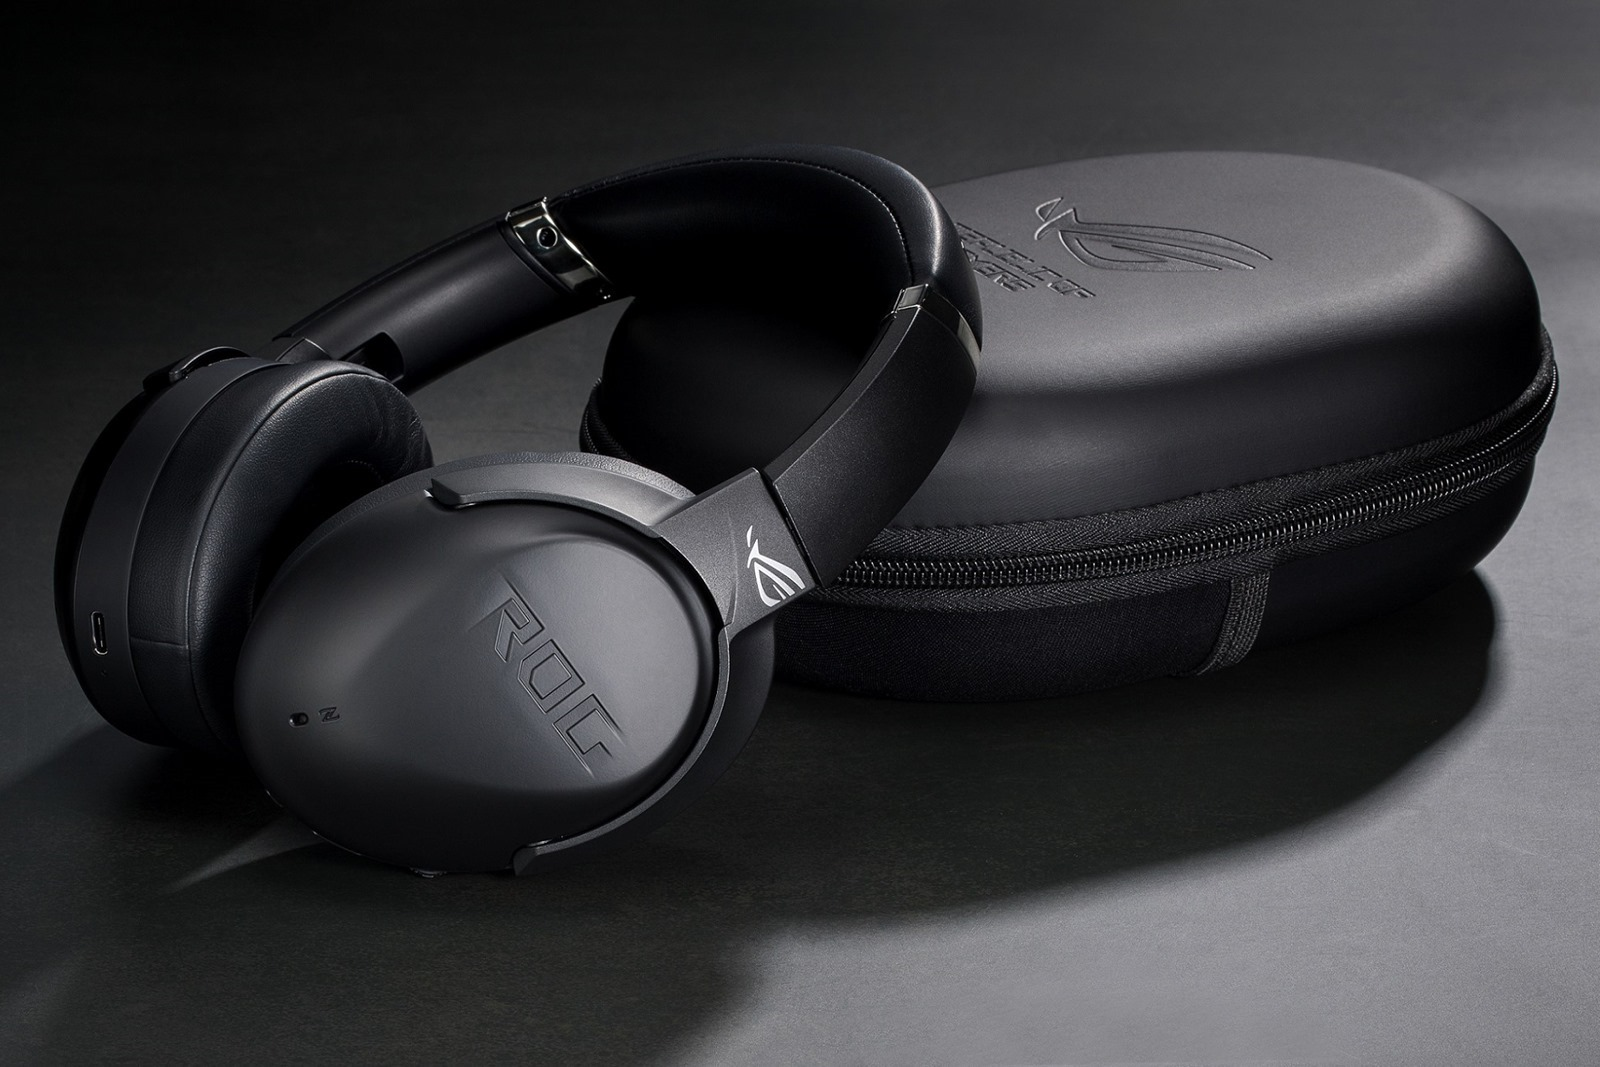 「ROG-Strix-Go-BT 電競耳機」採用高通 aptX-Adaptive 音頻技術,提供低延遲、高傳真的無線藍牙音訊。_thumb.jpg @3C 達人廖阿輝